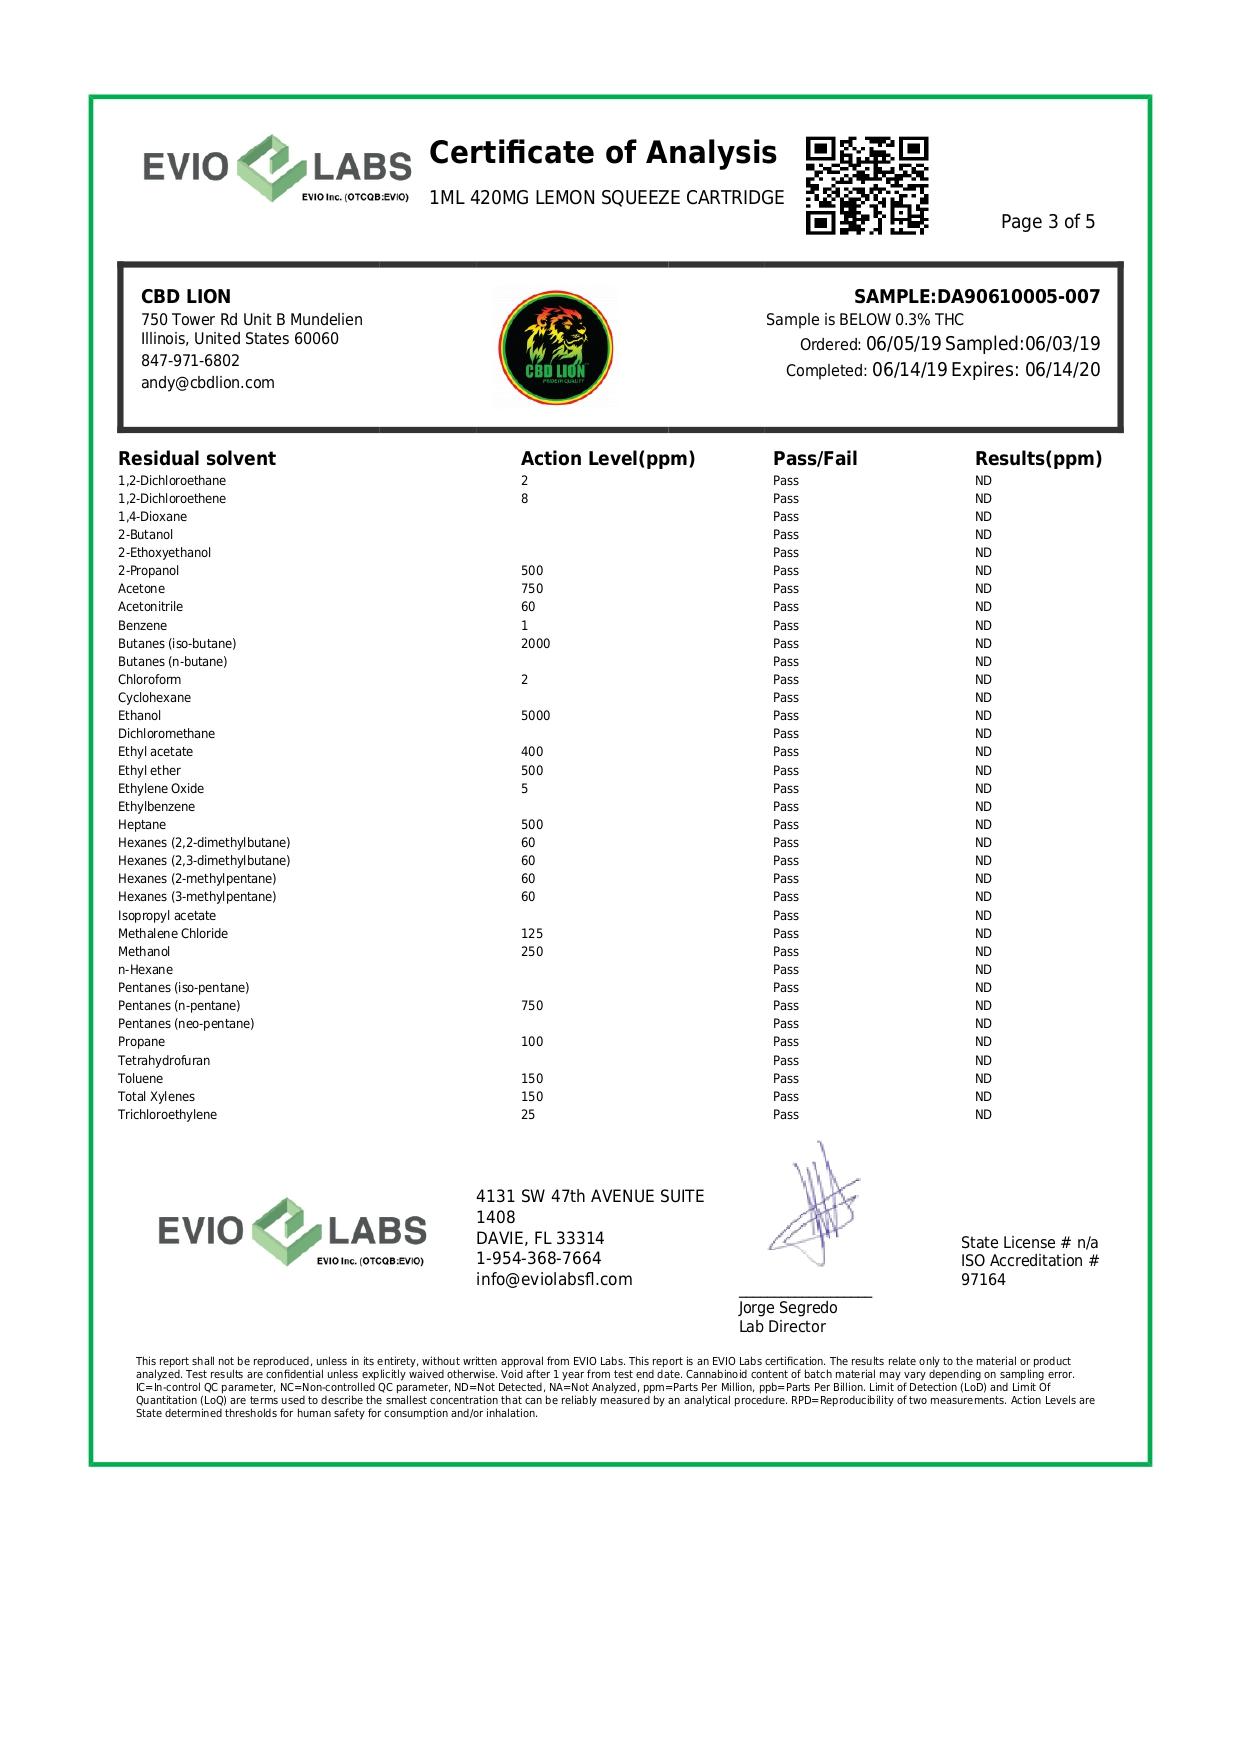 CBD Lion CBD Cartridge Lemon Squeeze 420mg Lab Report